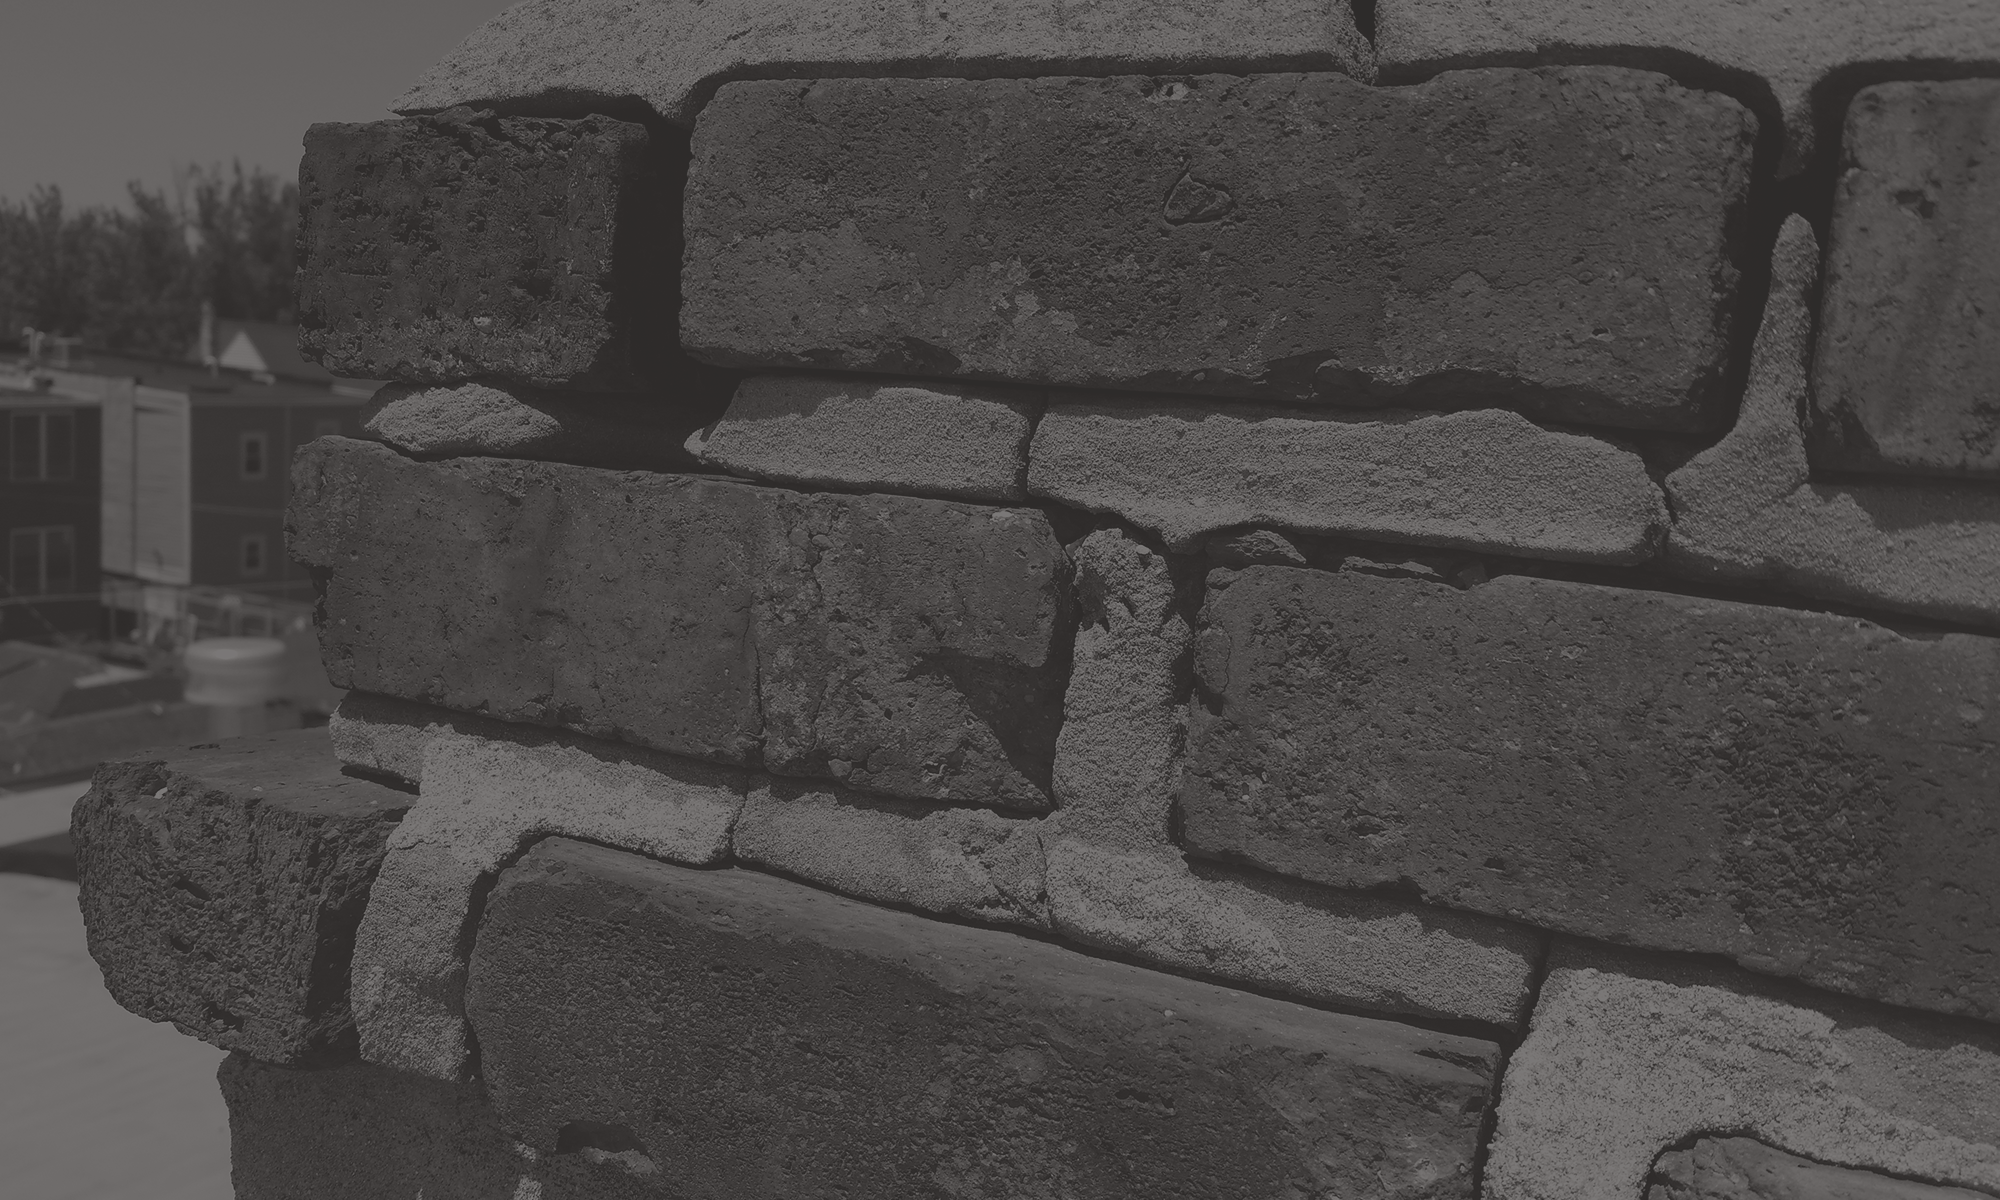 Commercial Brick Repair Services